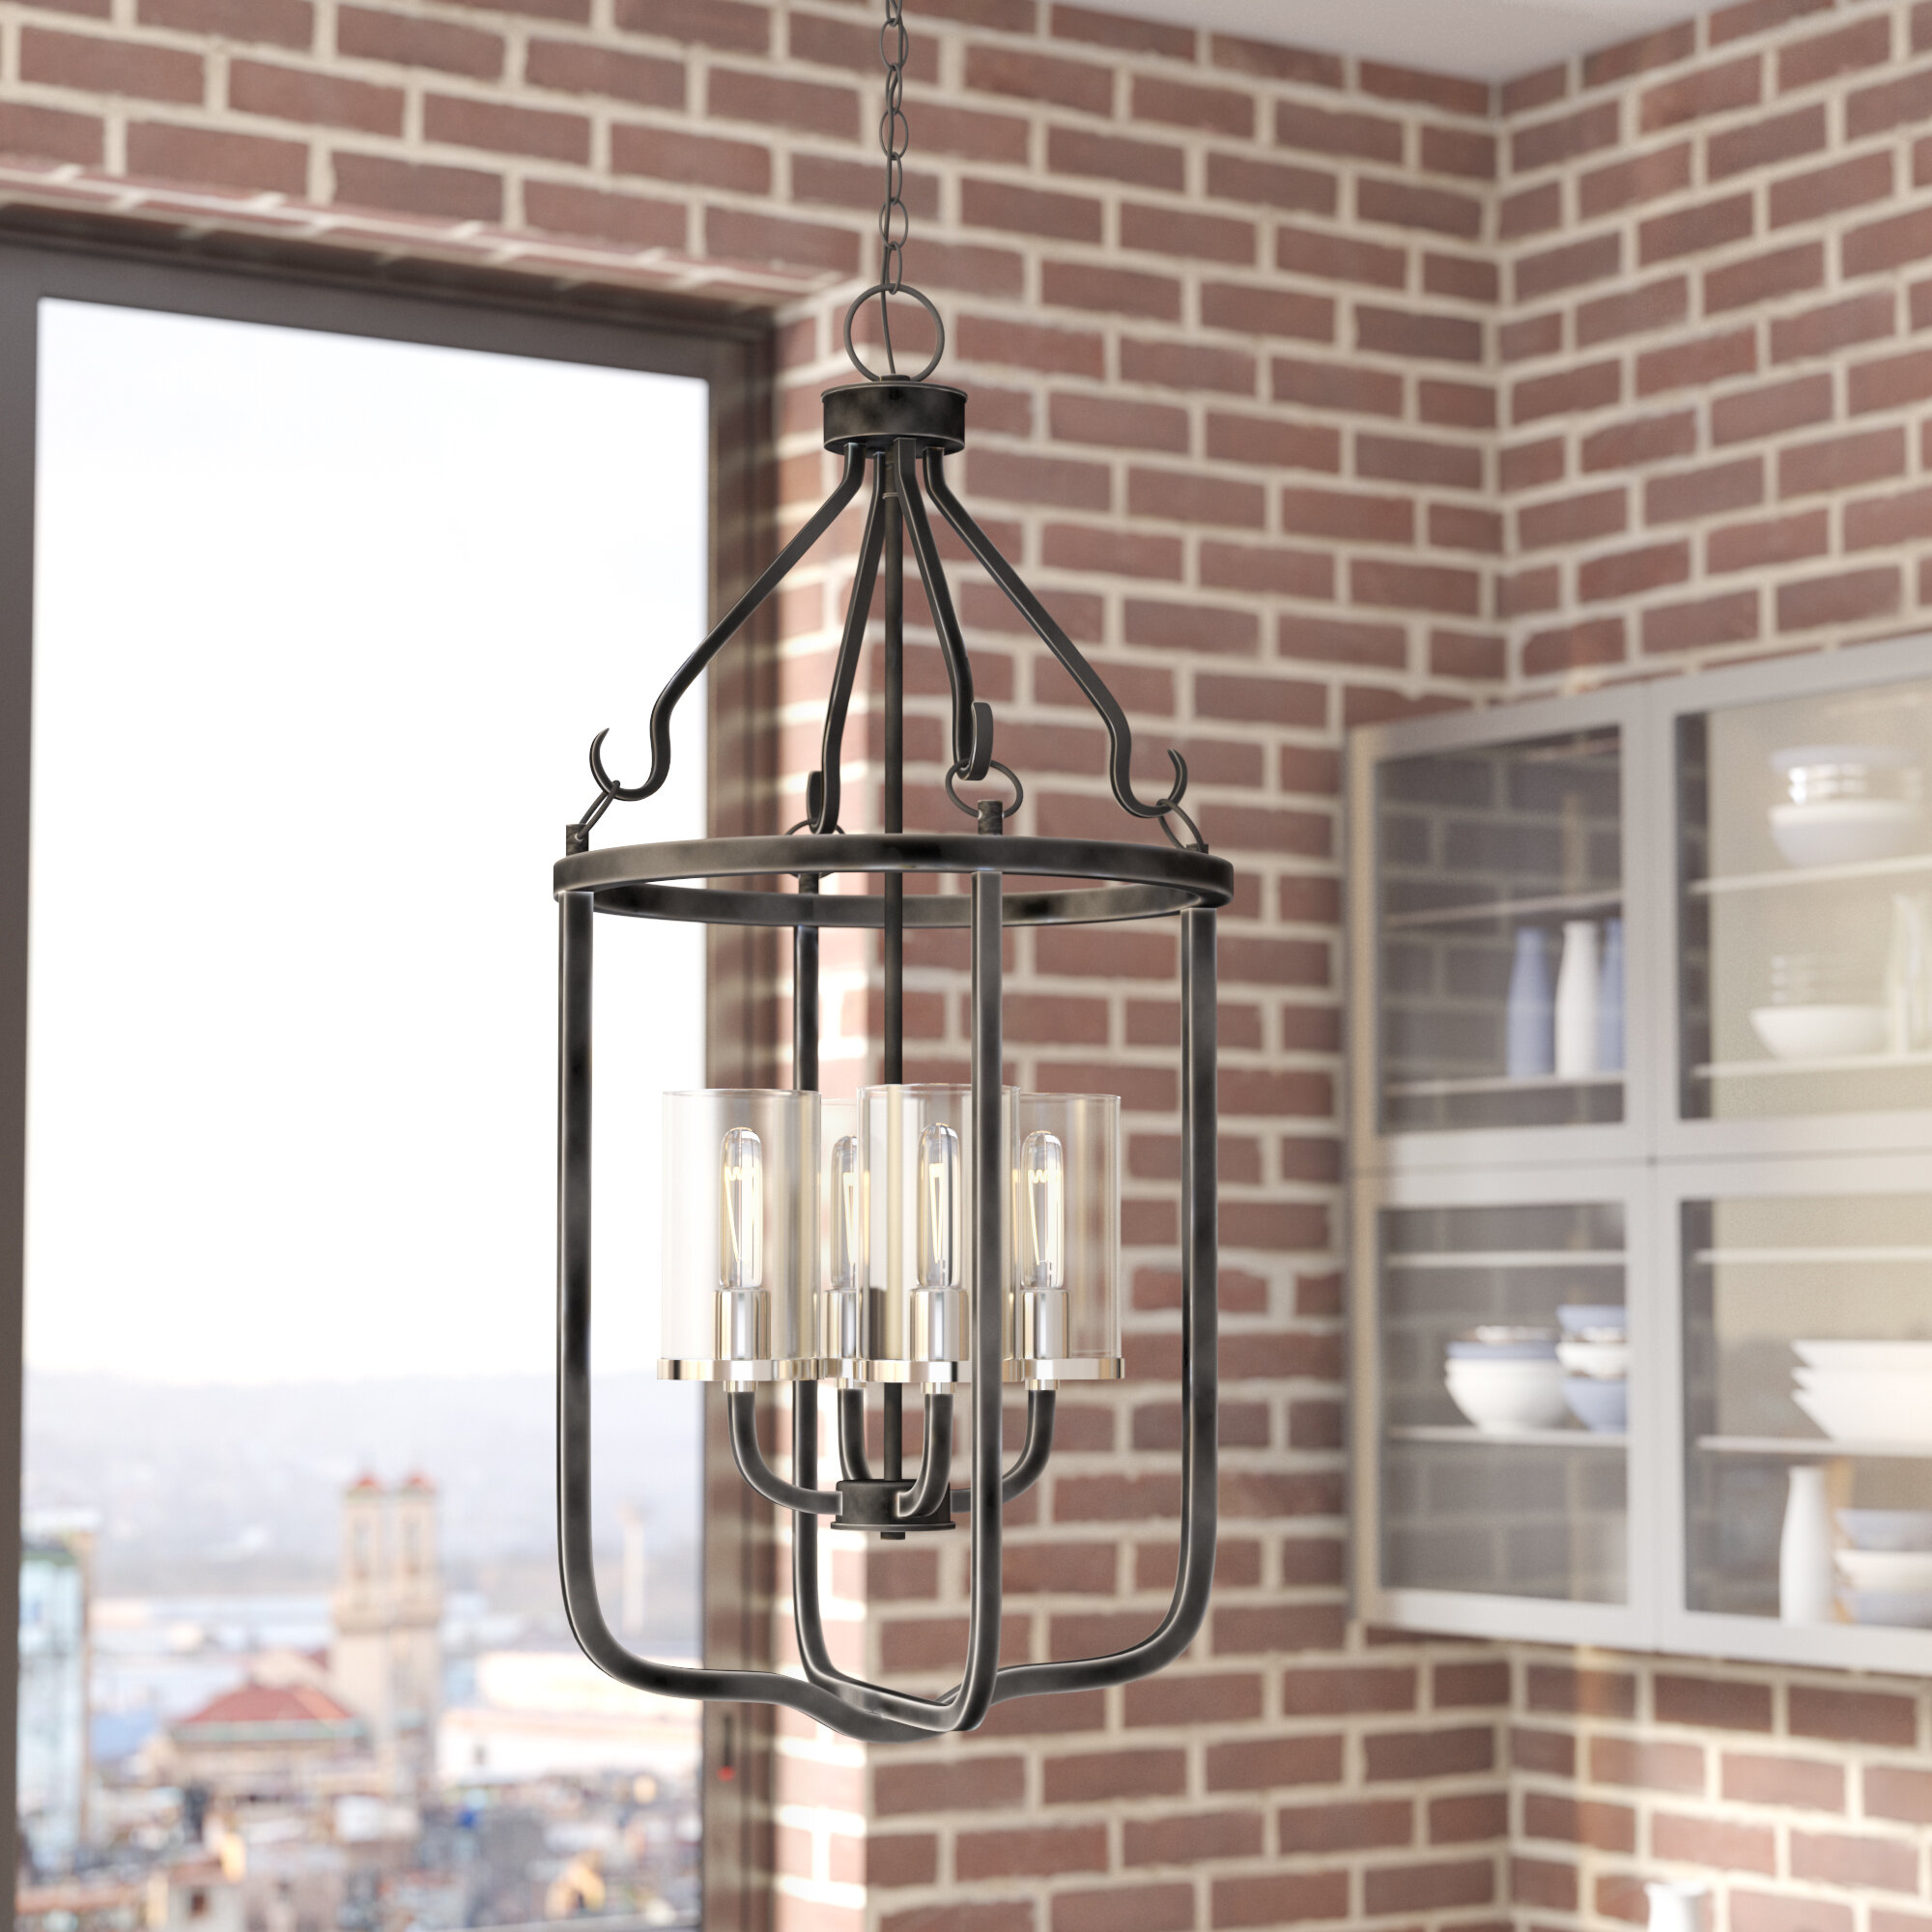 Kylee 4 light lantern pendant